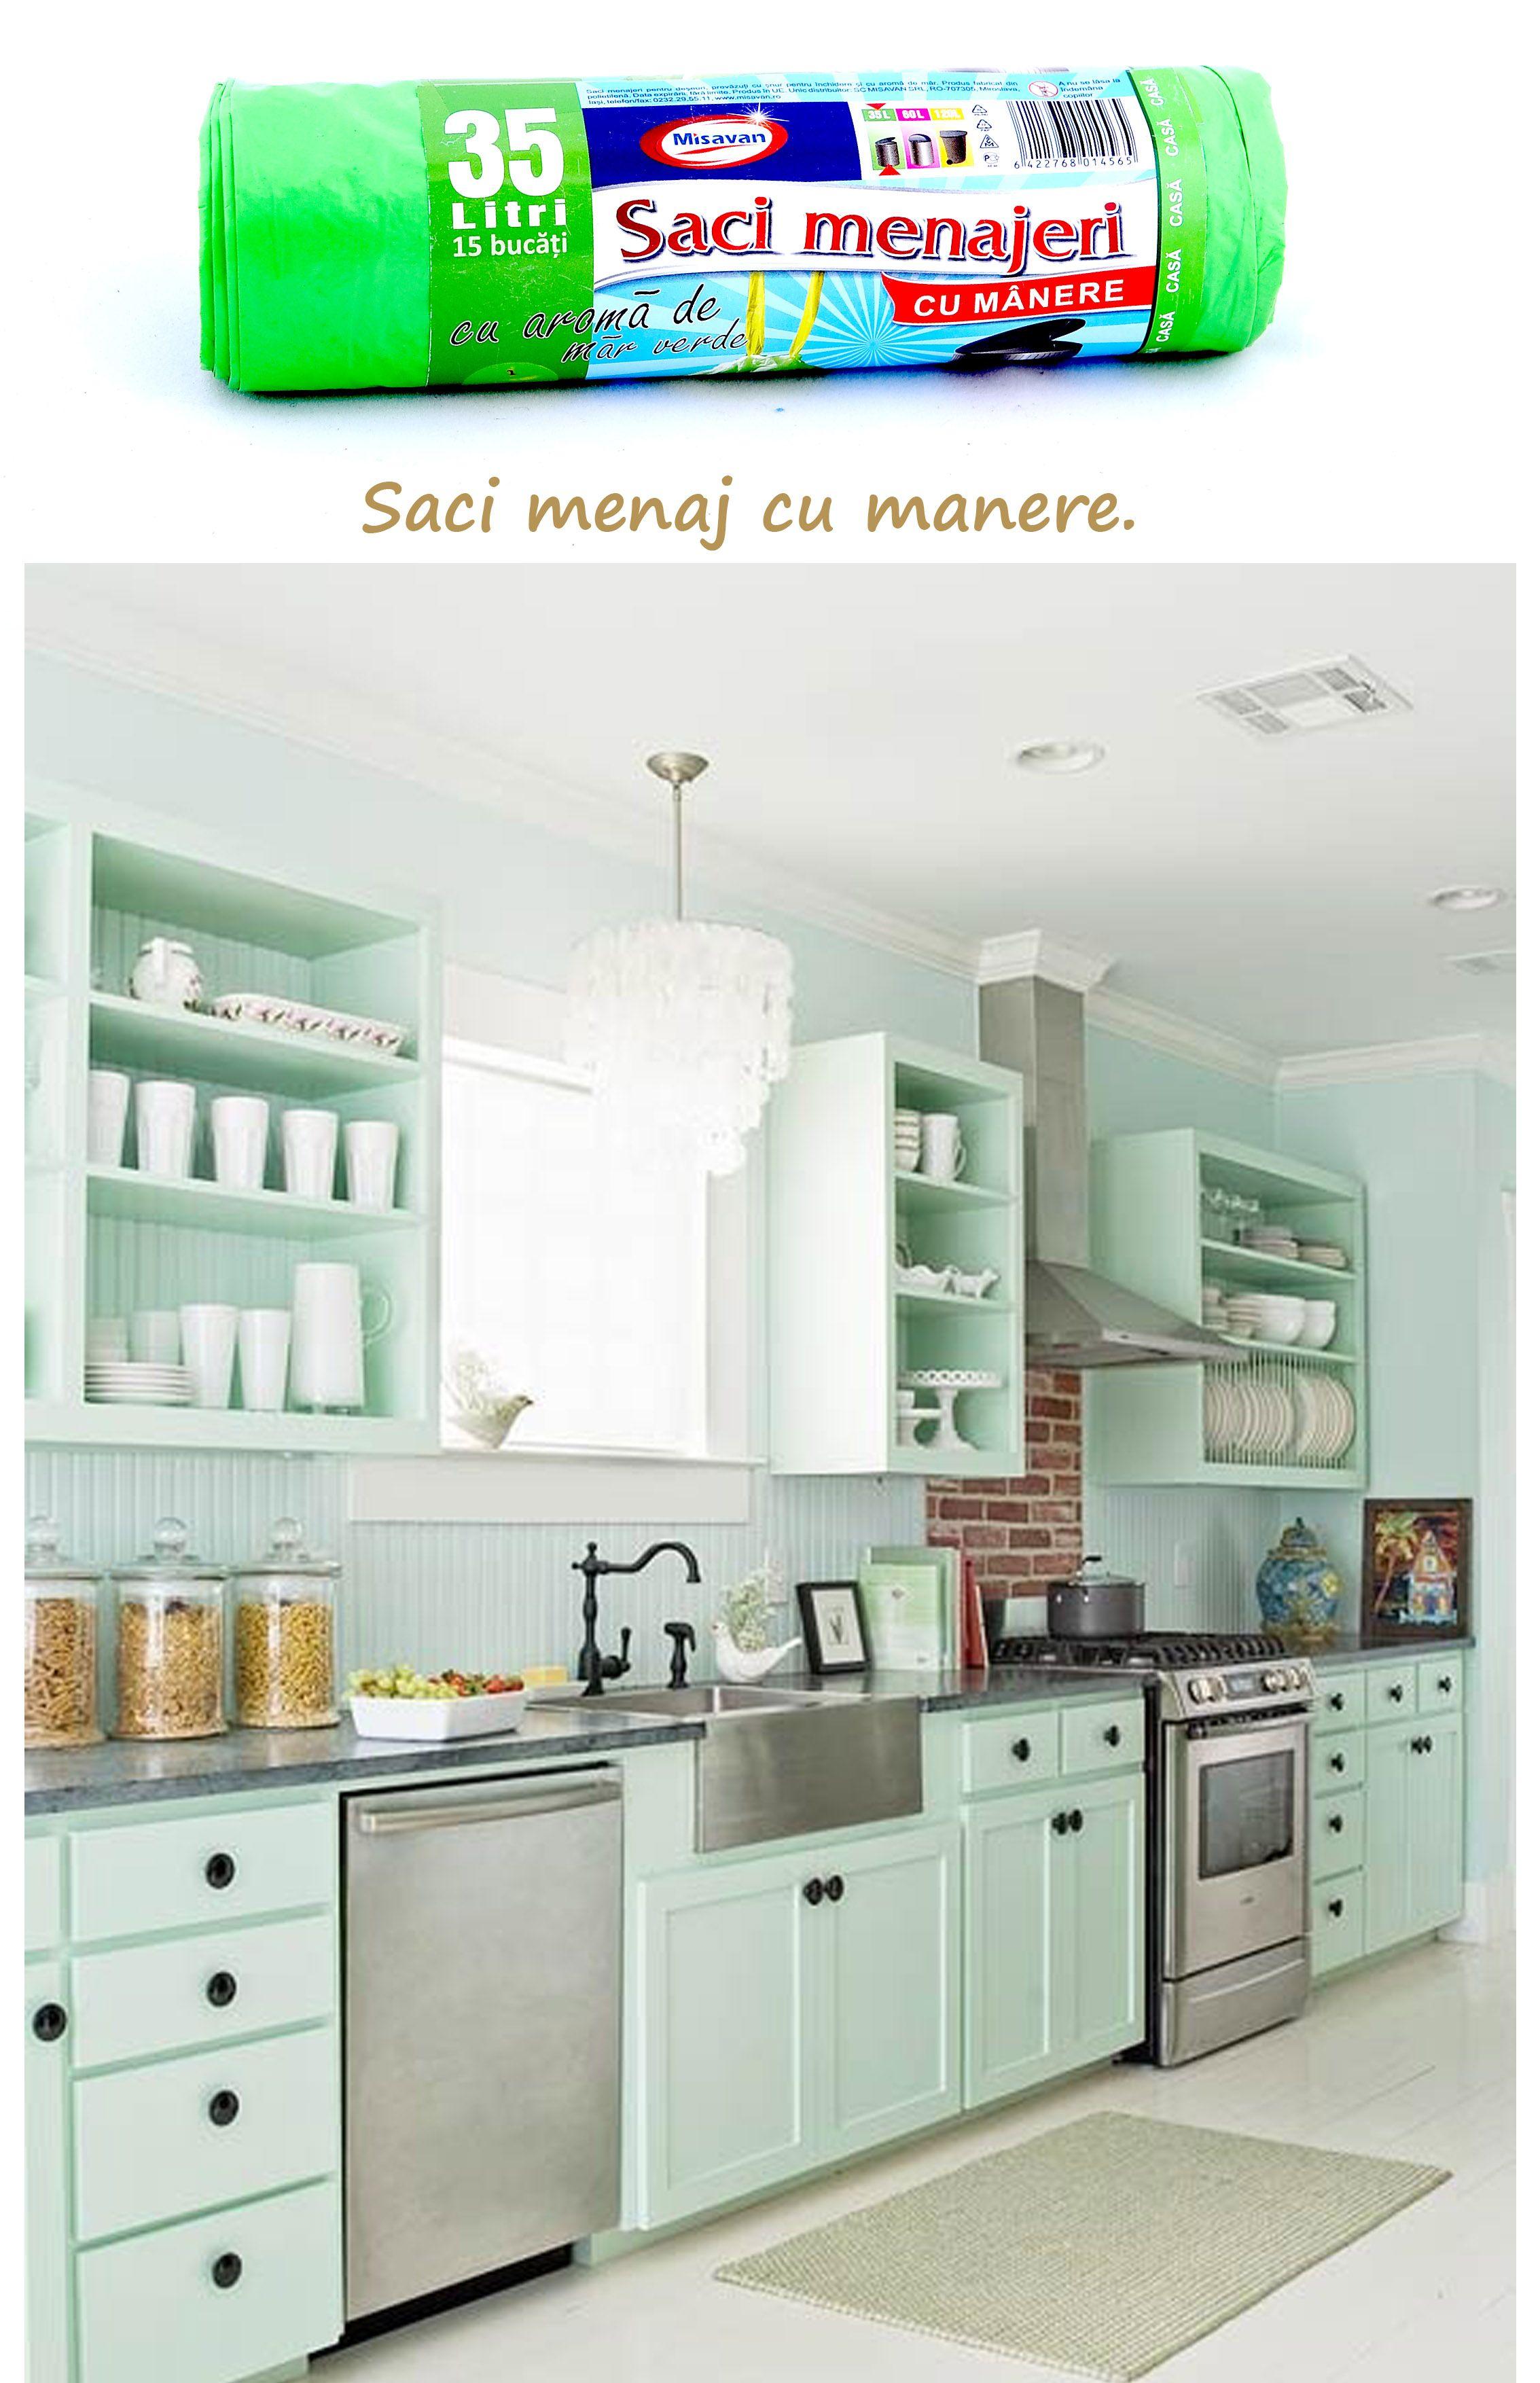 Saci Menaj Cu Manere 35l Http Www Produse Horeca Ro Baie Saci Menaj Cu Manere Mar Verde 3 Cottage Style Kitchen Green Kitchen Cabinets Green Kitchen Designs